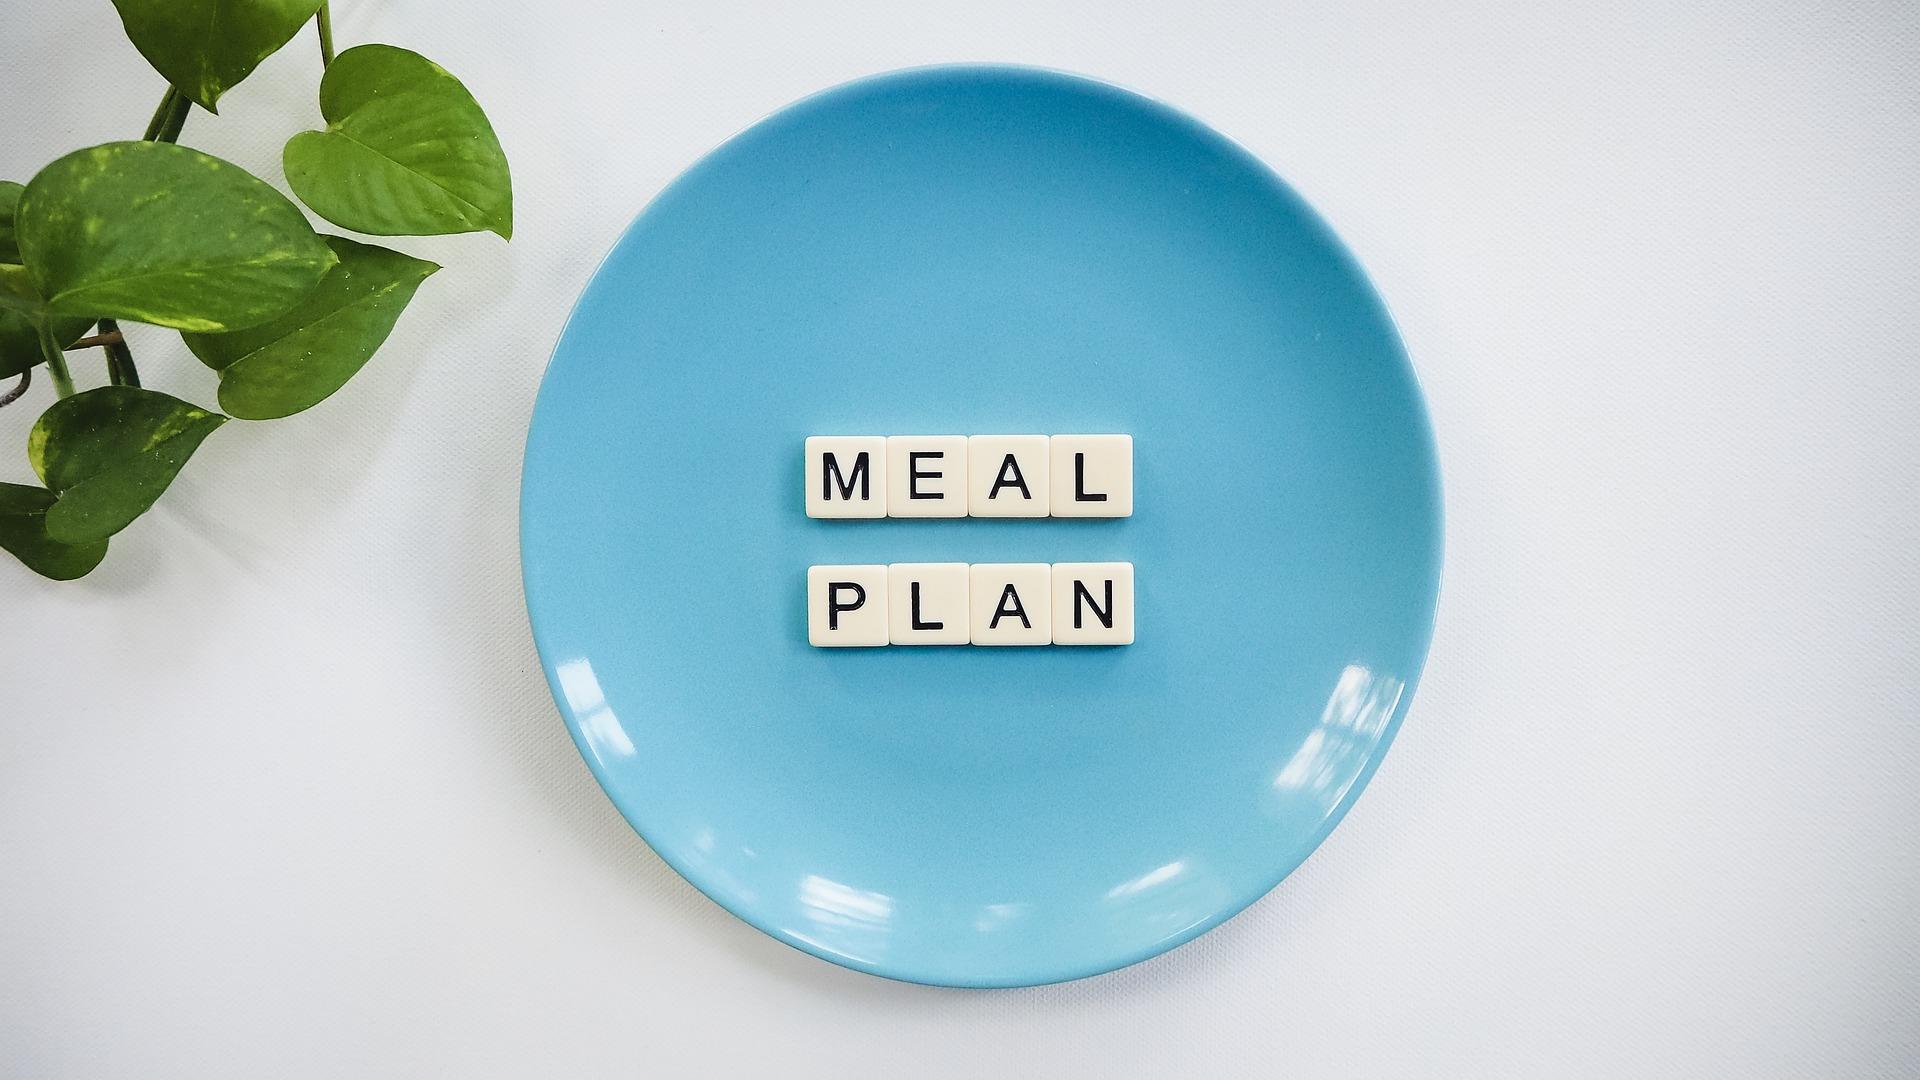 organizacija prehrane